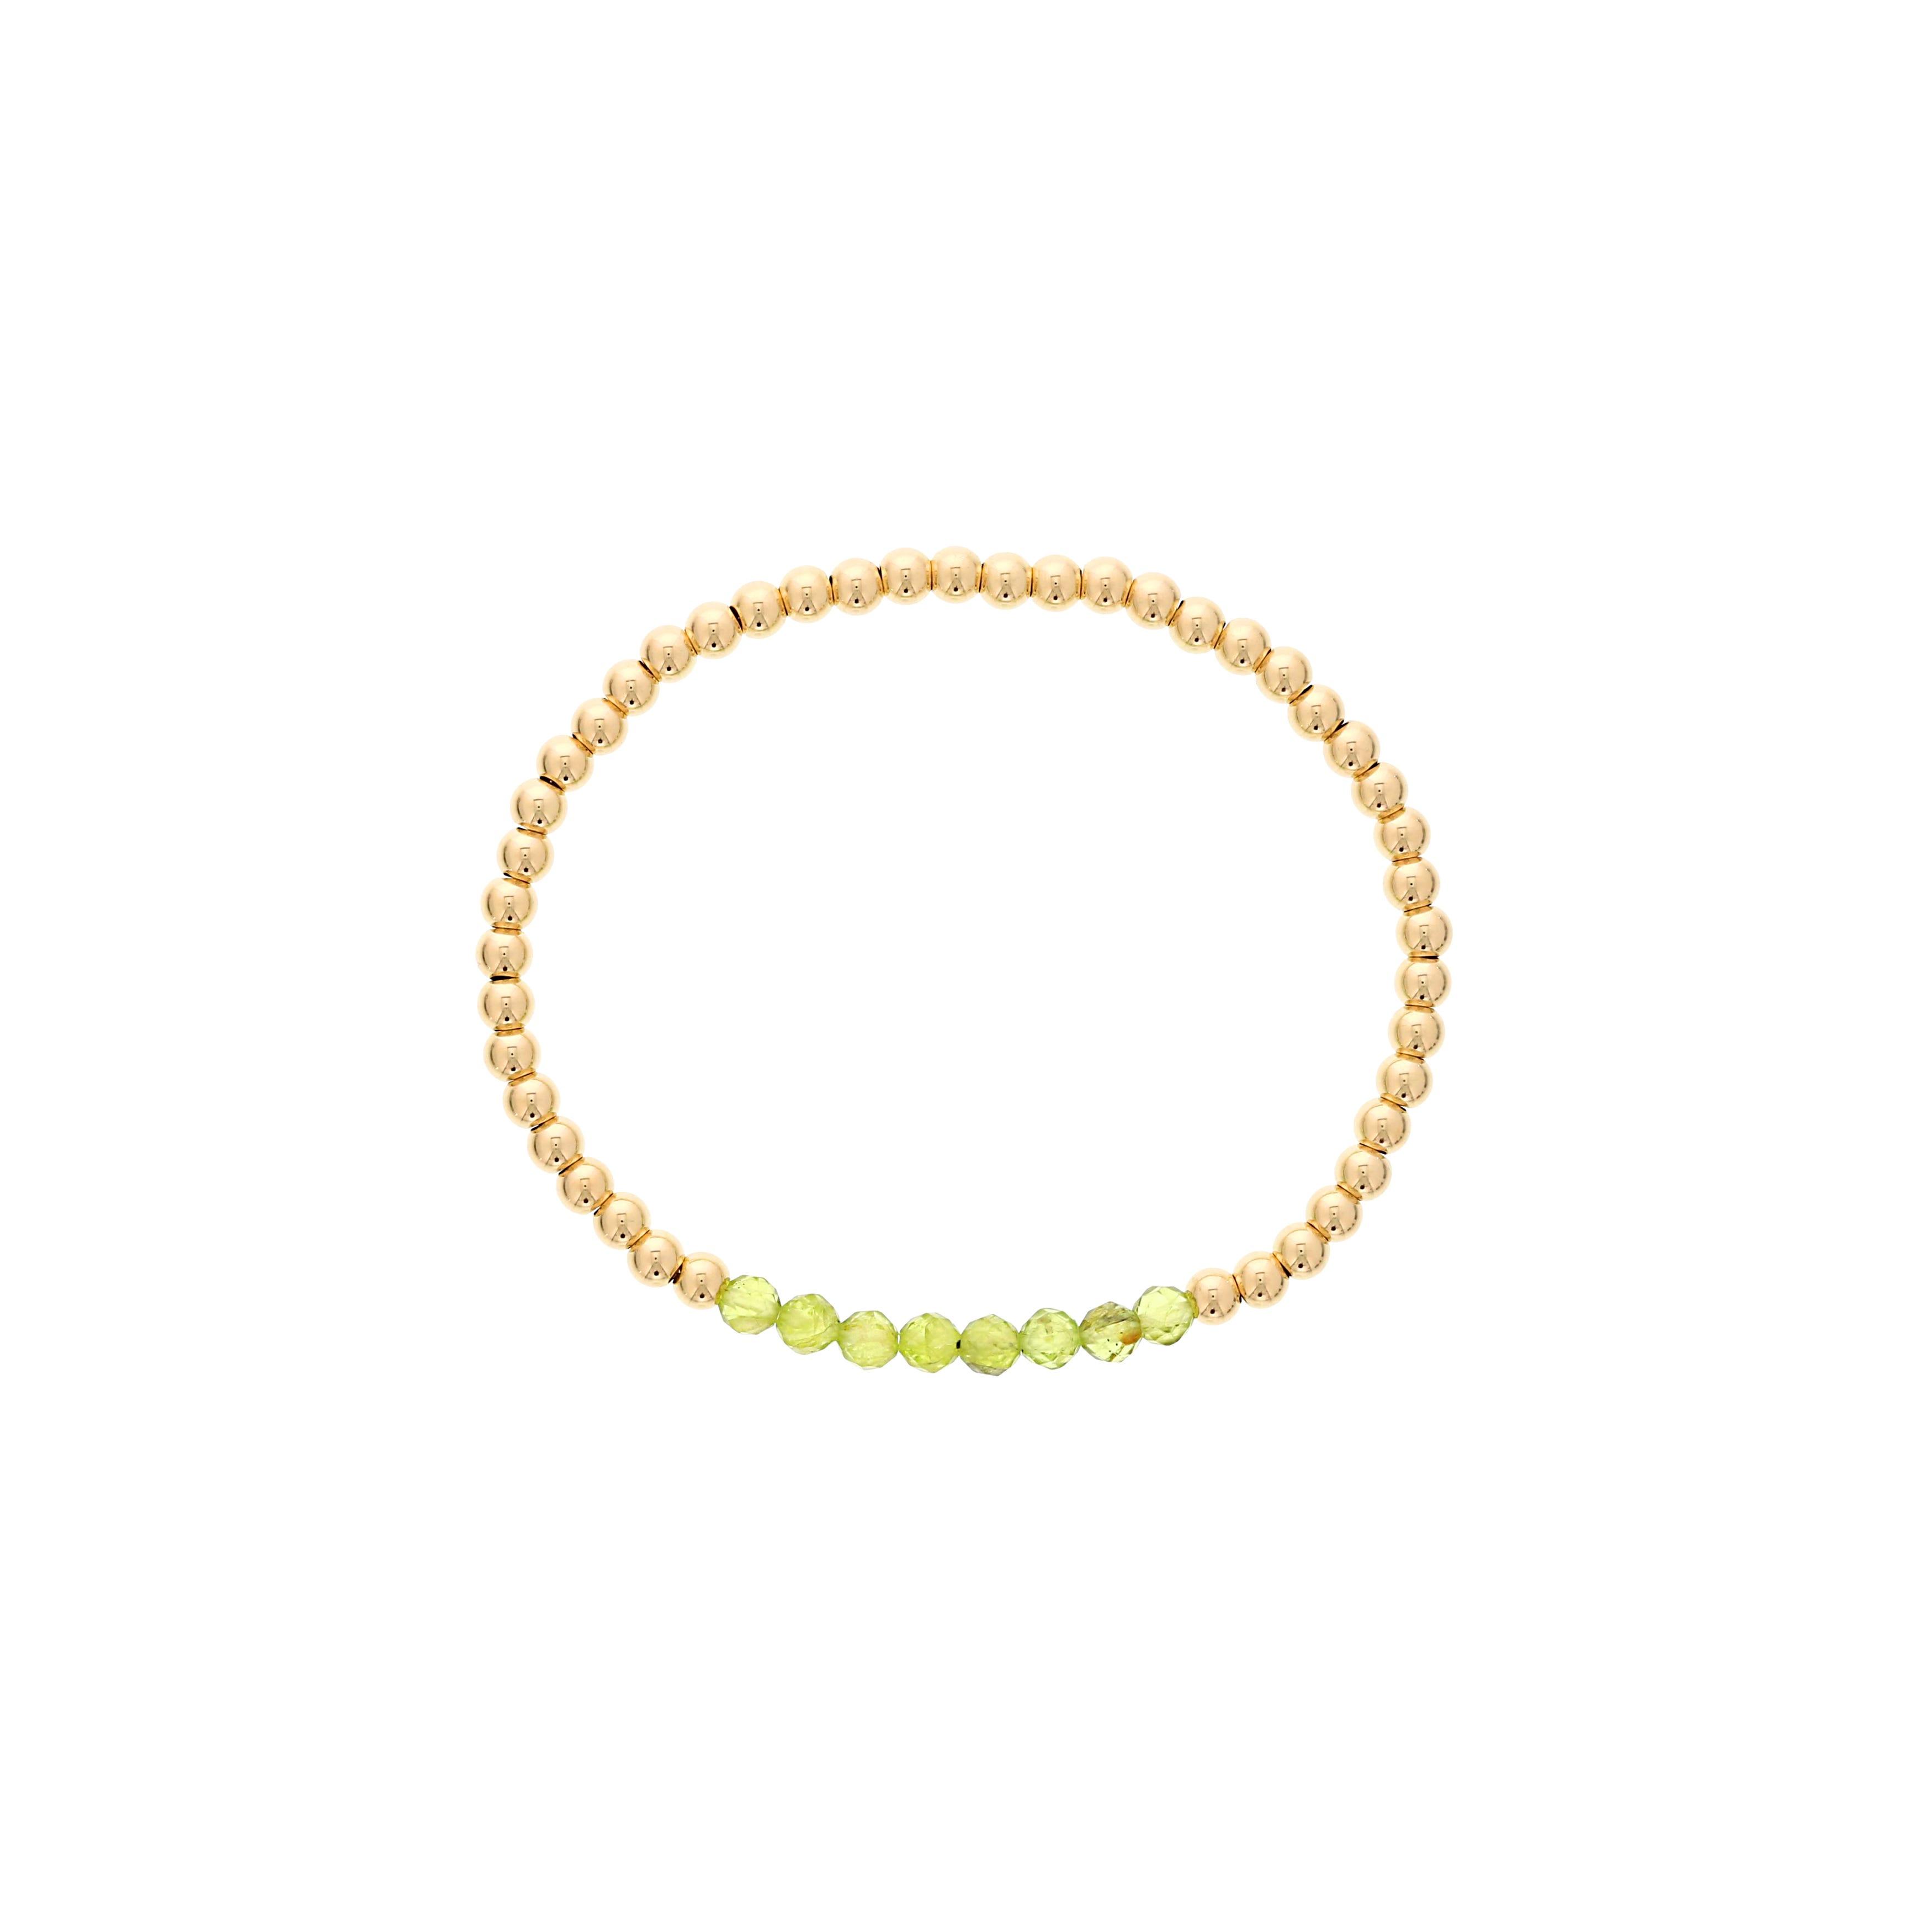 Peridot Birthstone Beaded Bracelet Gold Filled